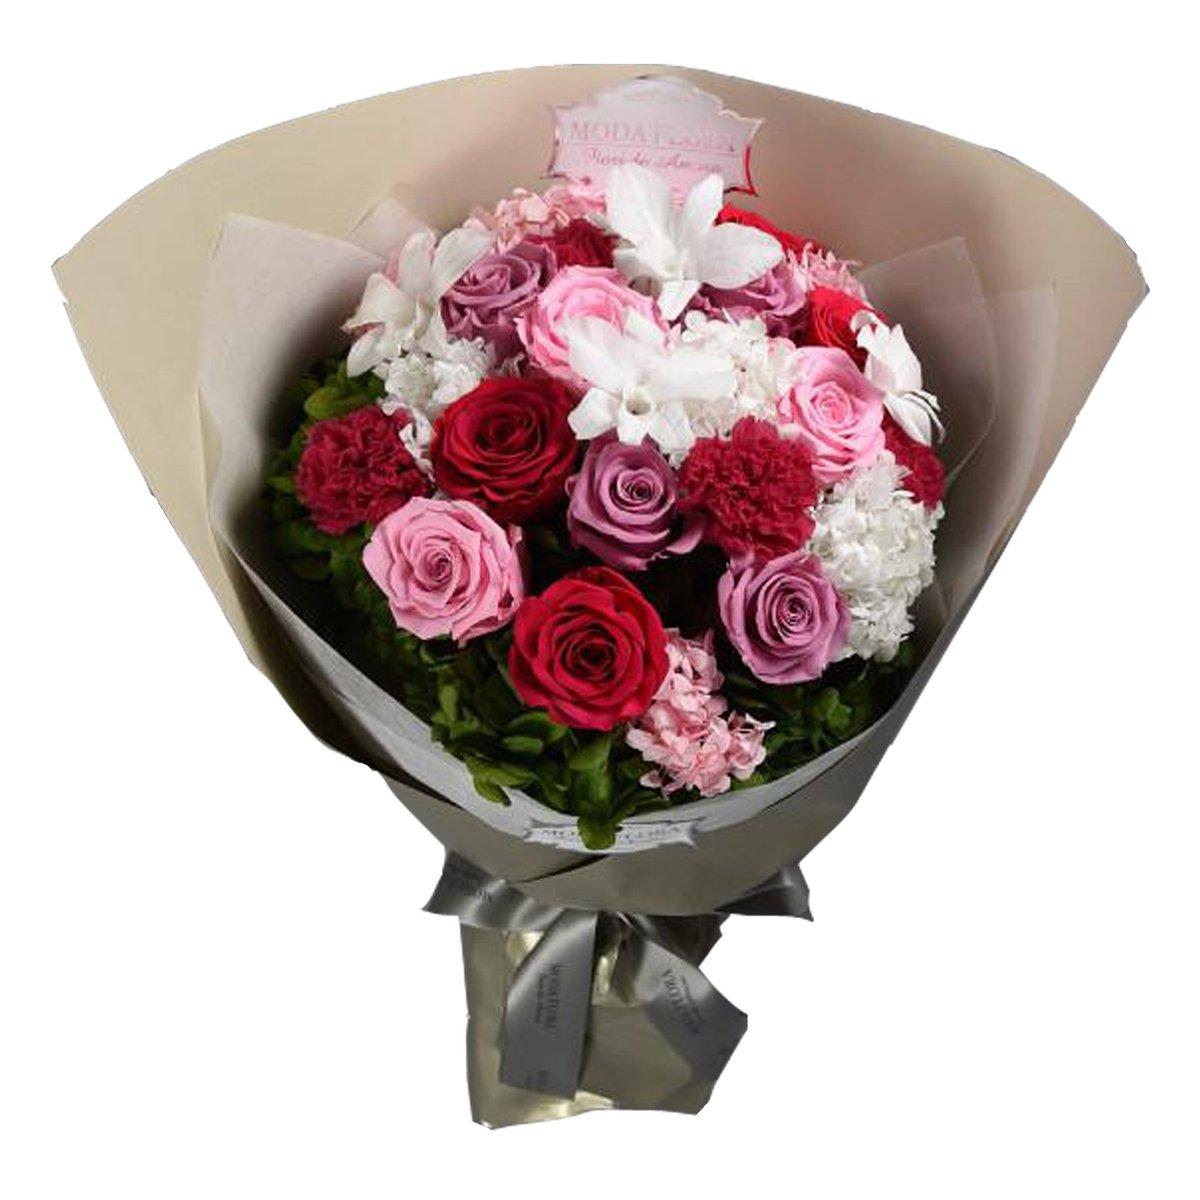 Moda flora mothers day preserved flower bouquet hktvmall online mothers day preserved flower bouquet izmirmasajfo